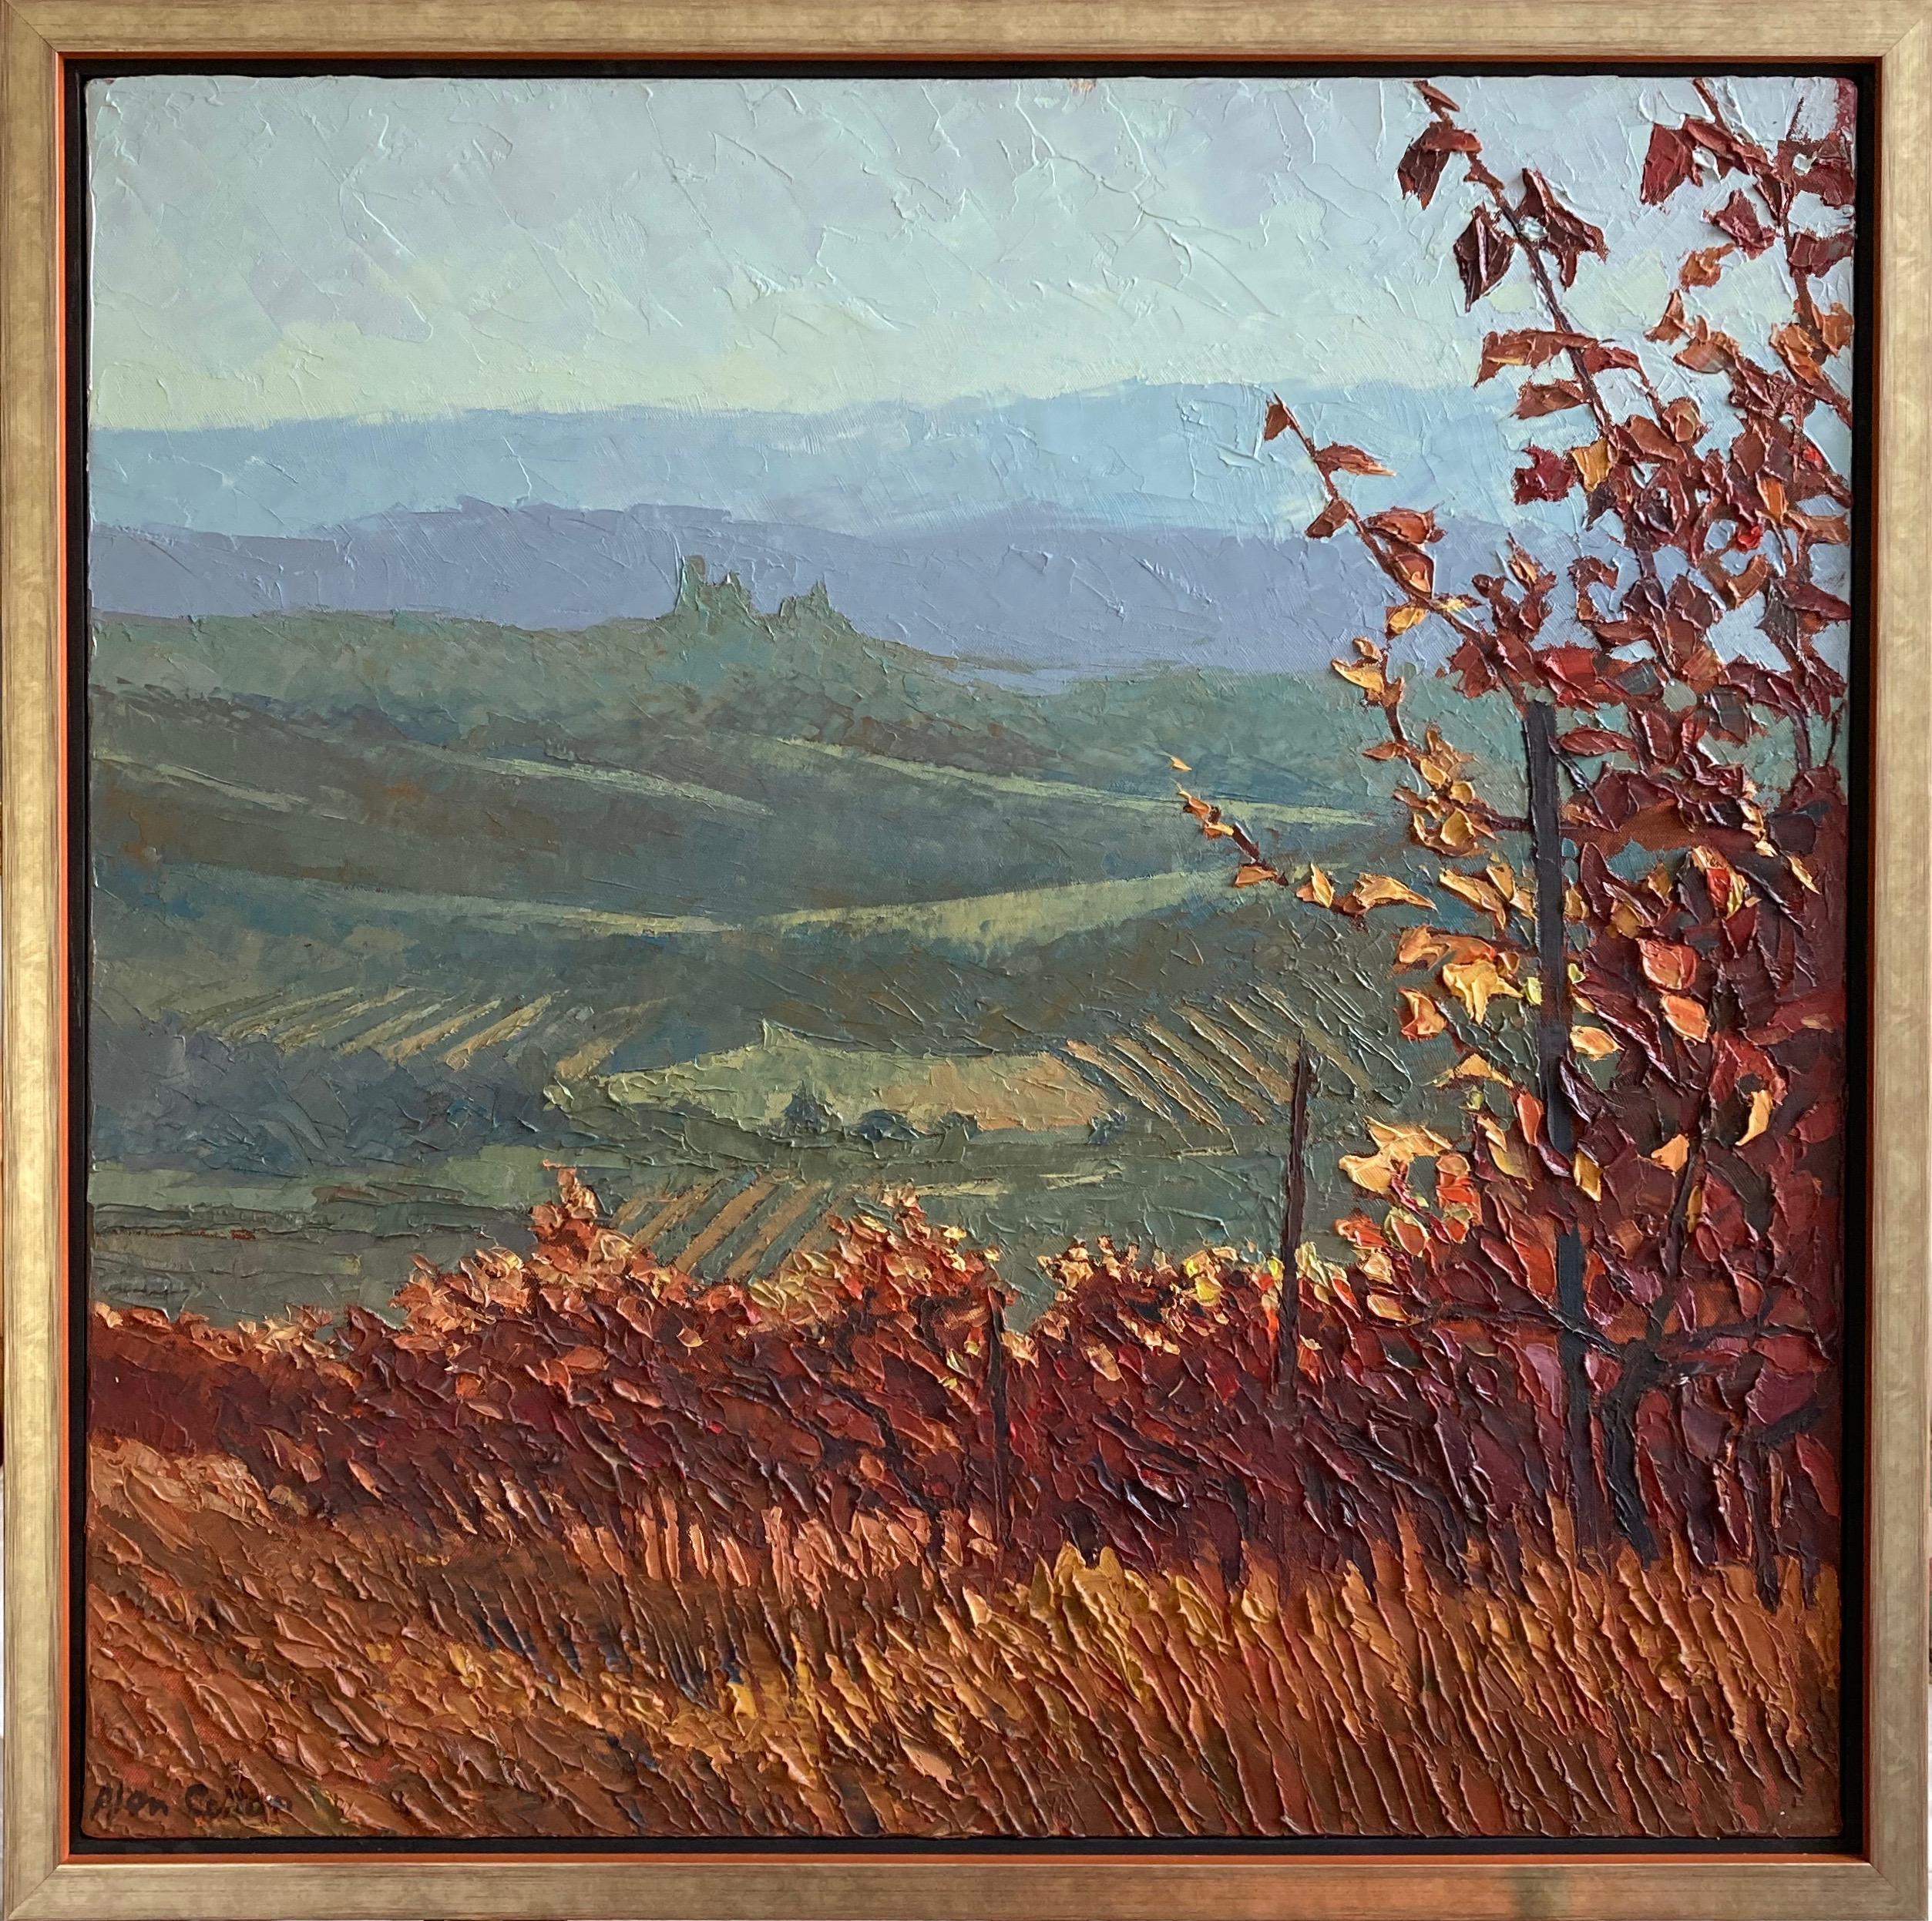 Alan Cotton, Piedmont, Impressionist scene of Italian vineyard in fall colours.